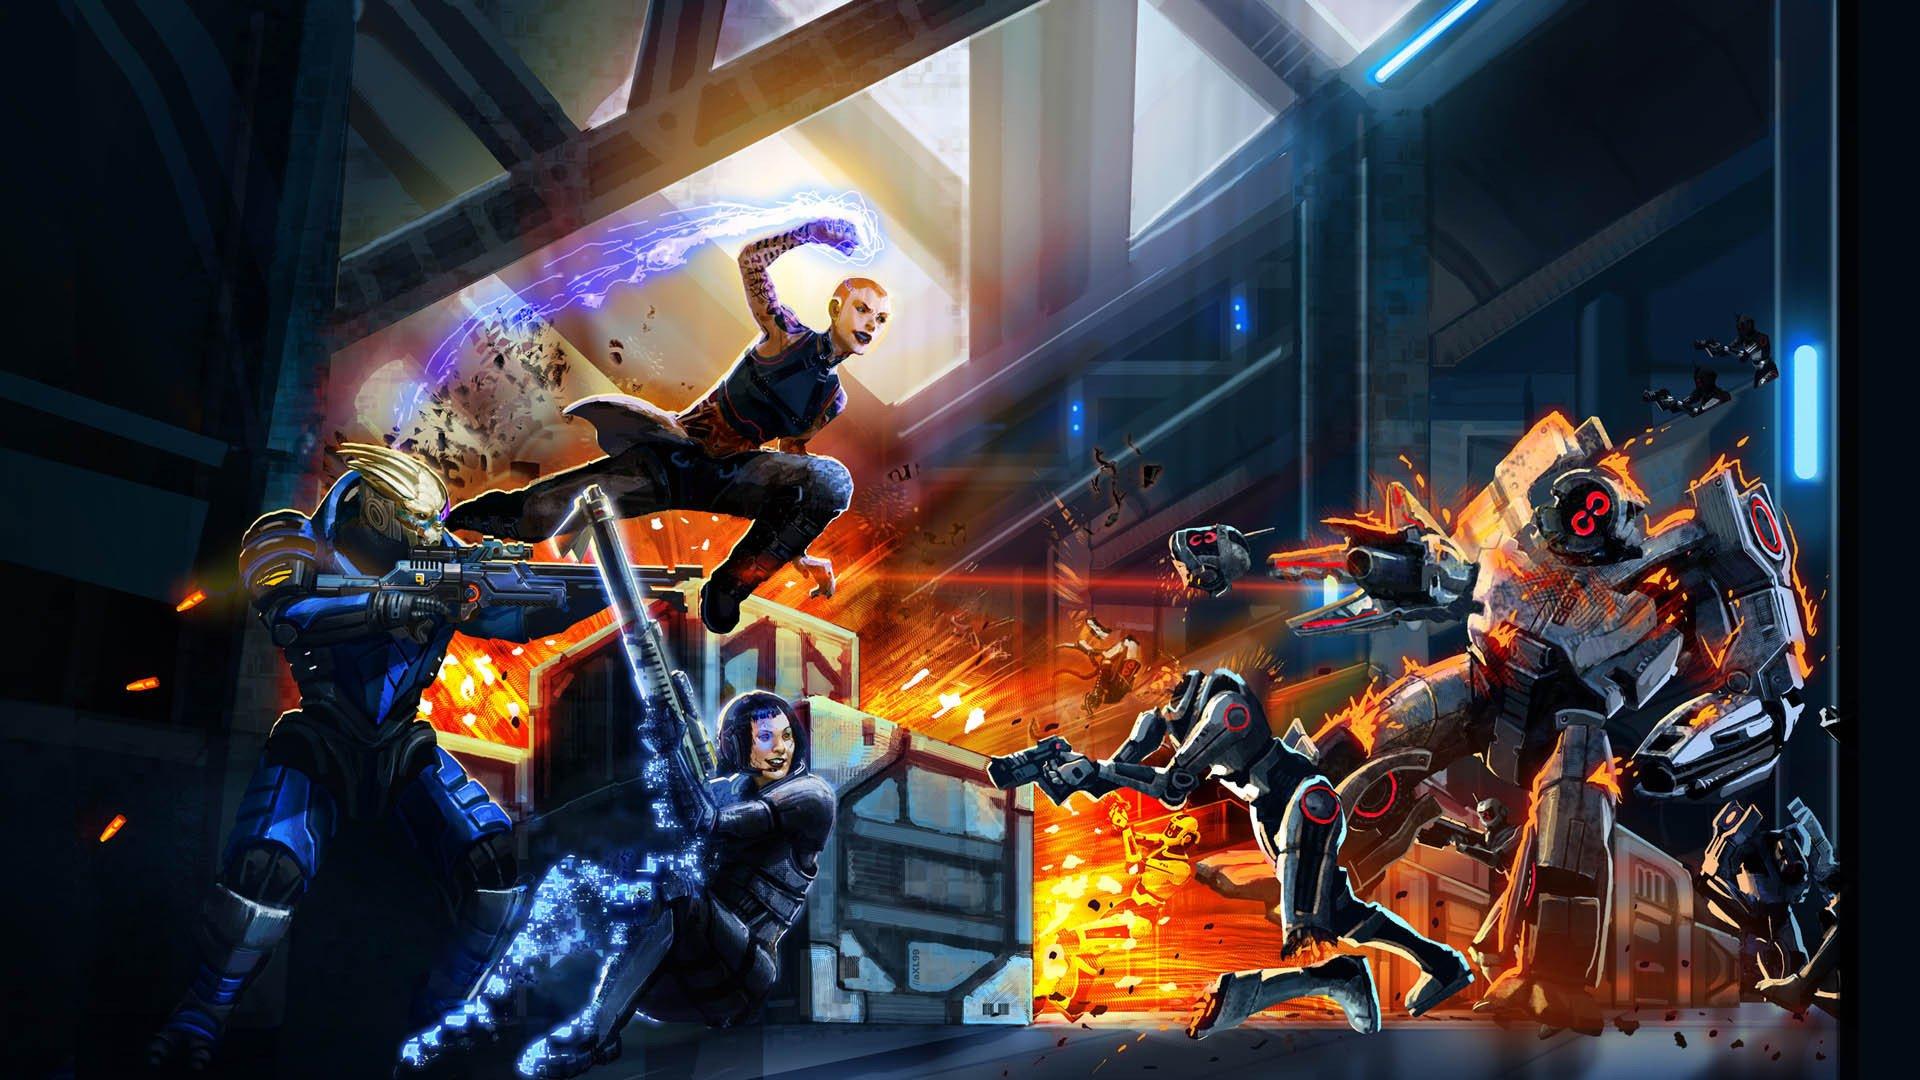 Mass Effect 2 Hd Wallpaper Background Image 1920x1080 Id